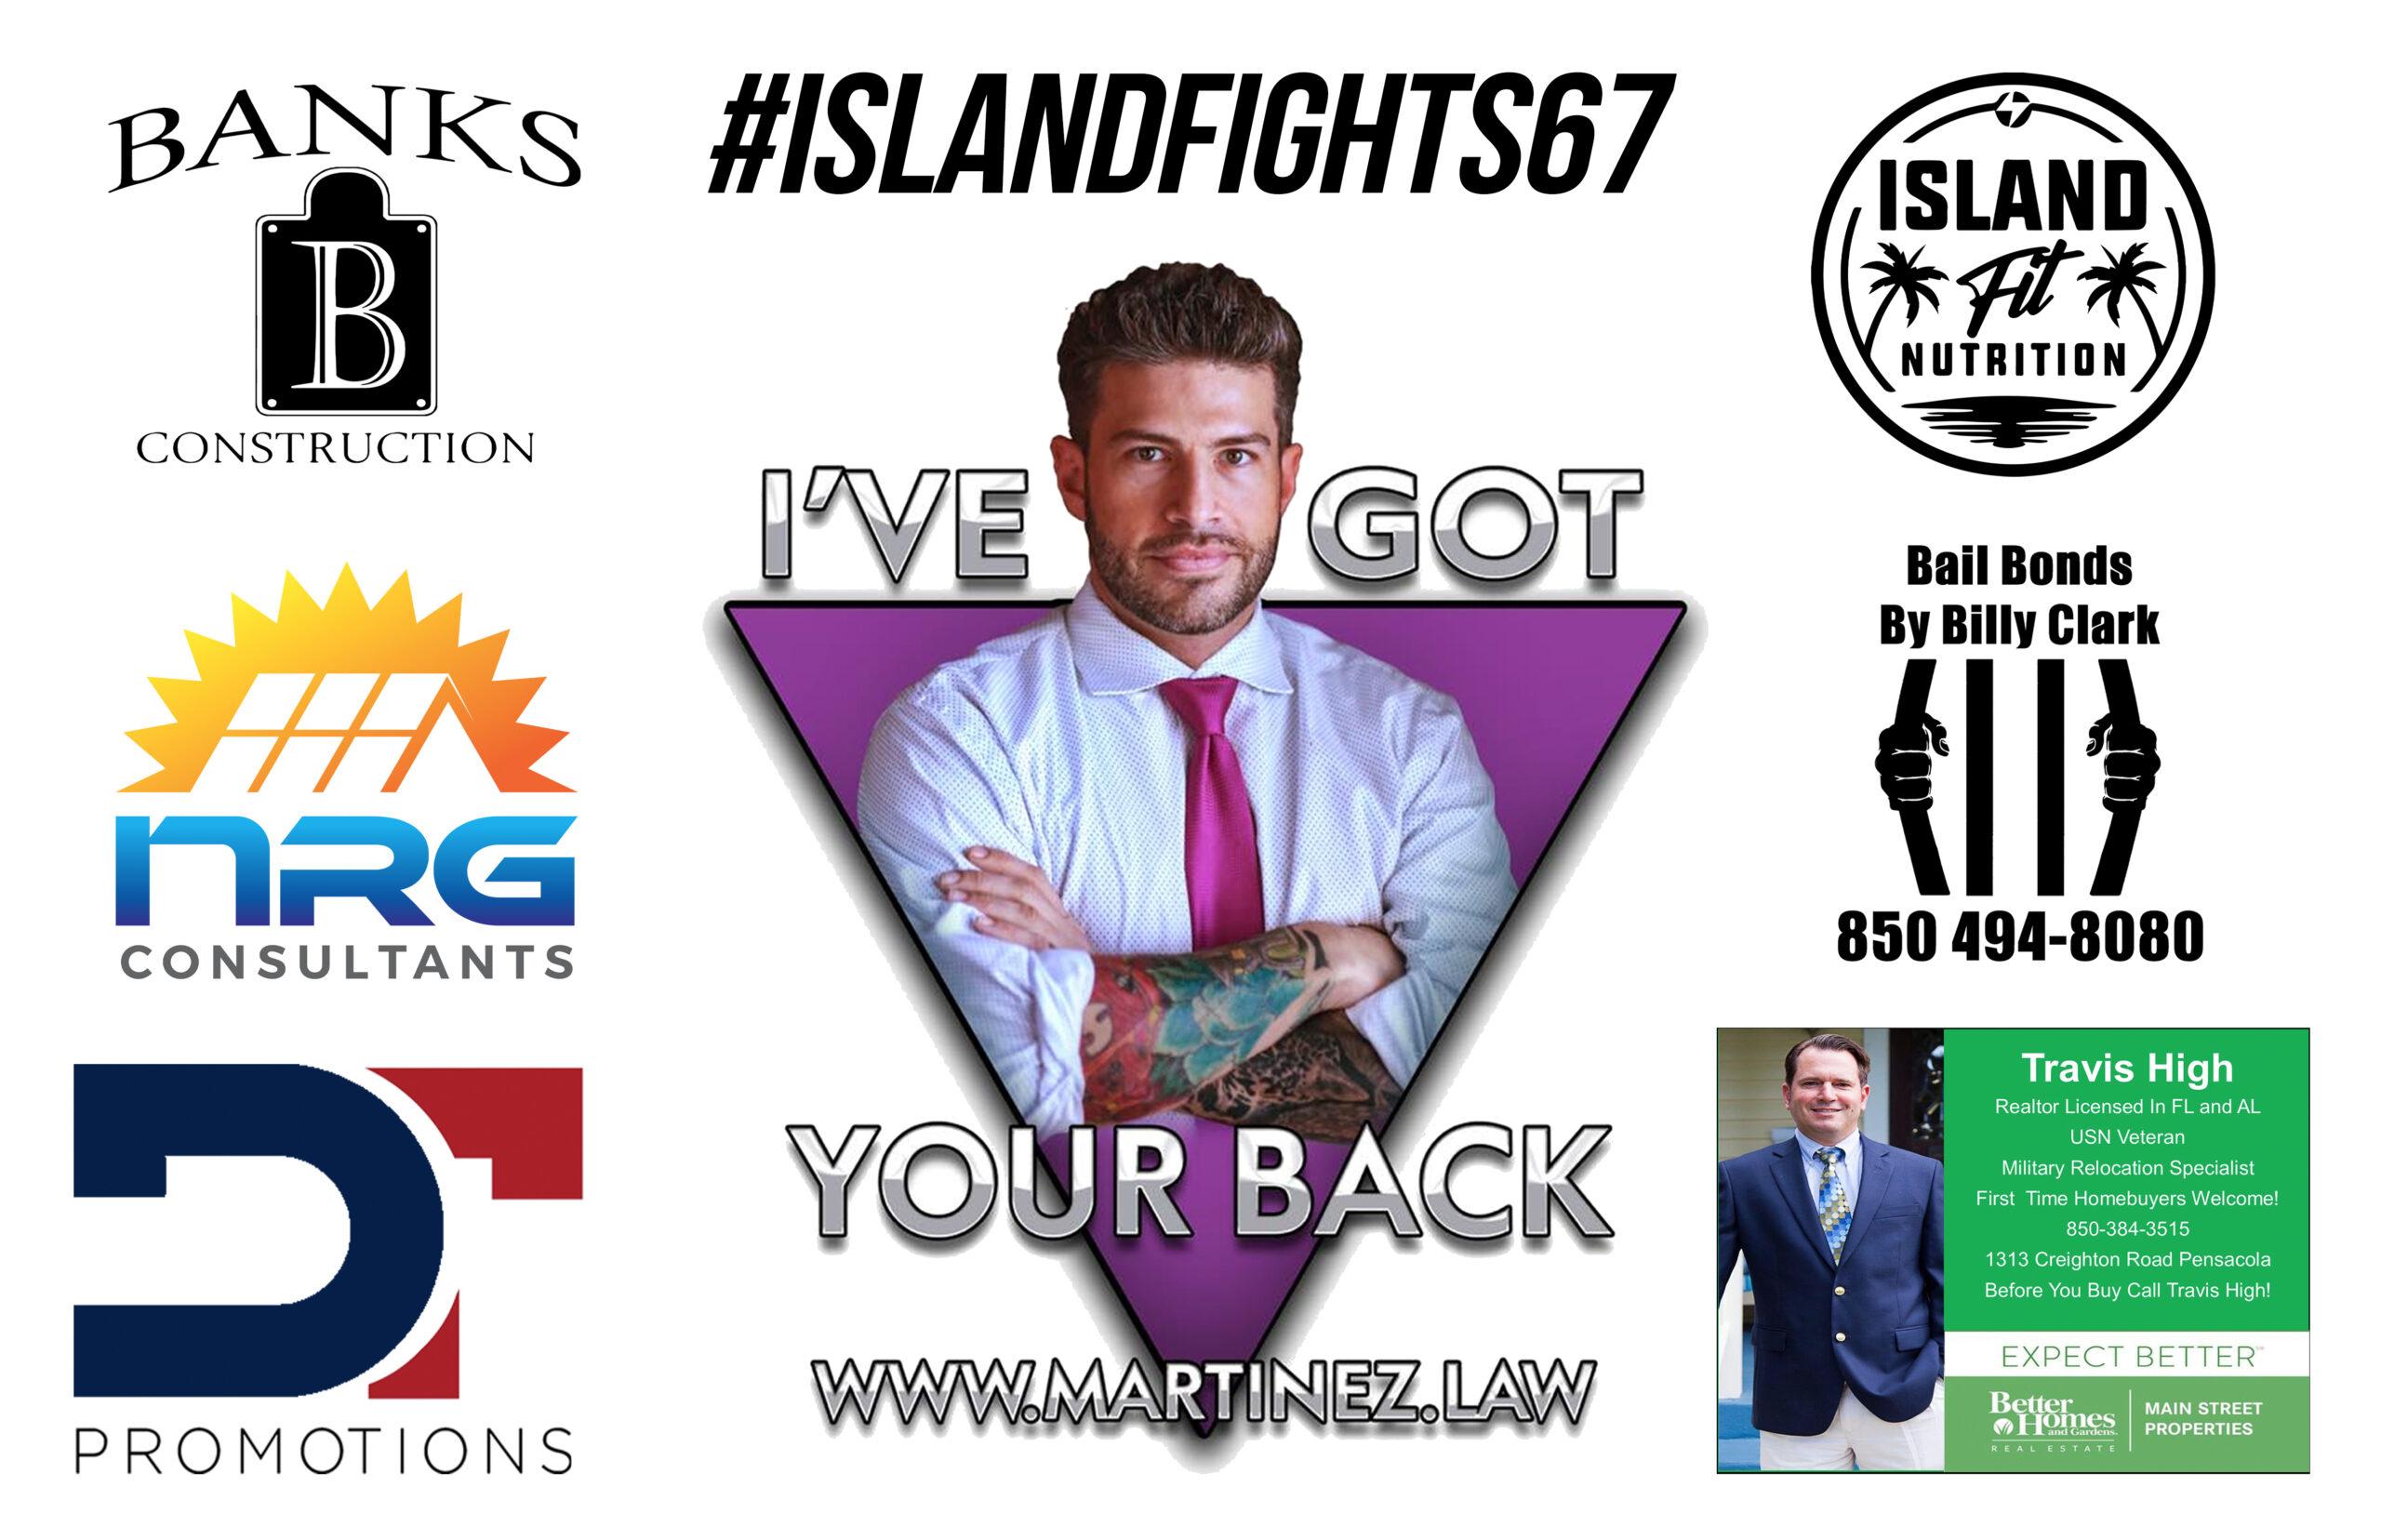 Island Fight Fightcard